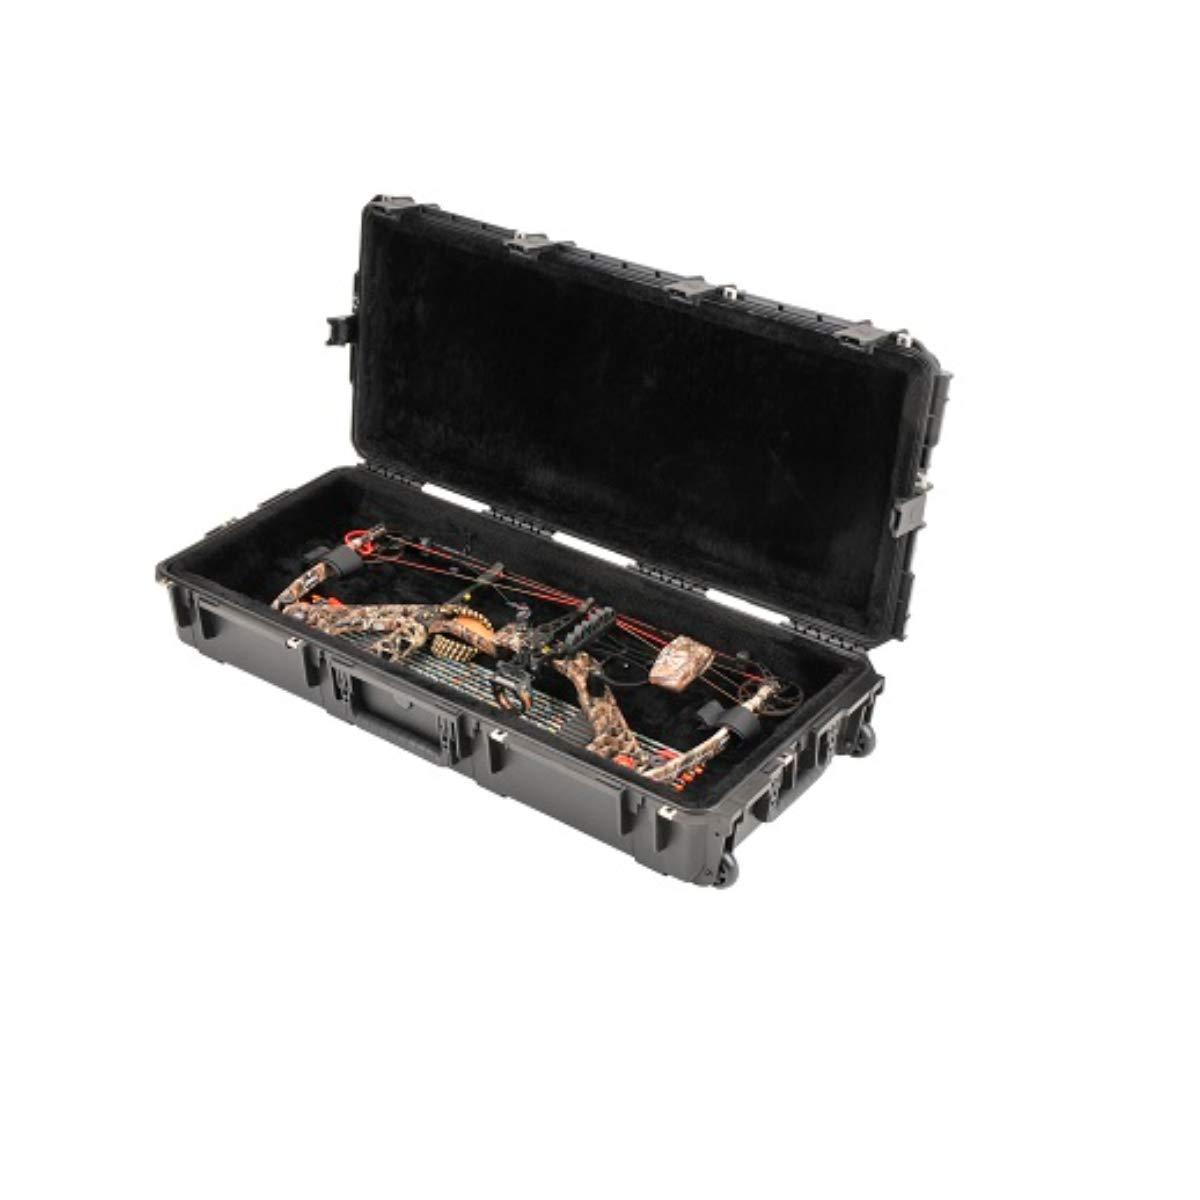 SKB 3i-4217-PL Injection-Molded Parallel Limb Bow Case Black